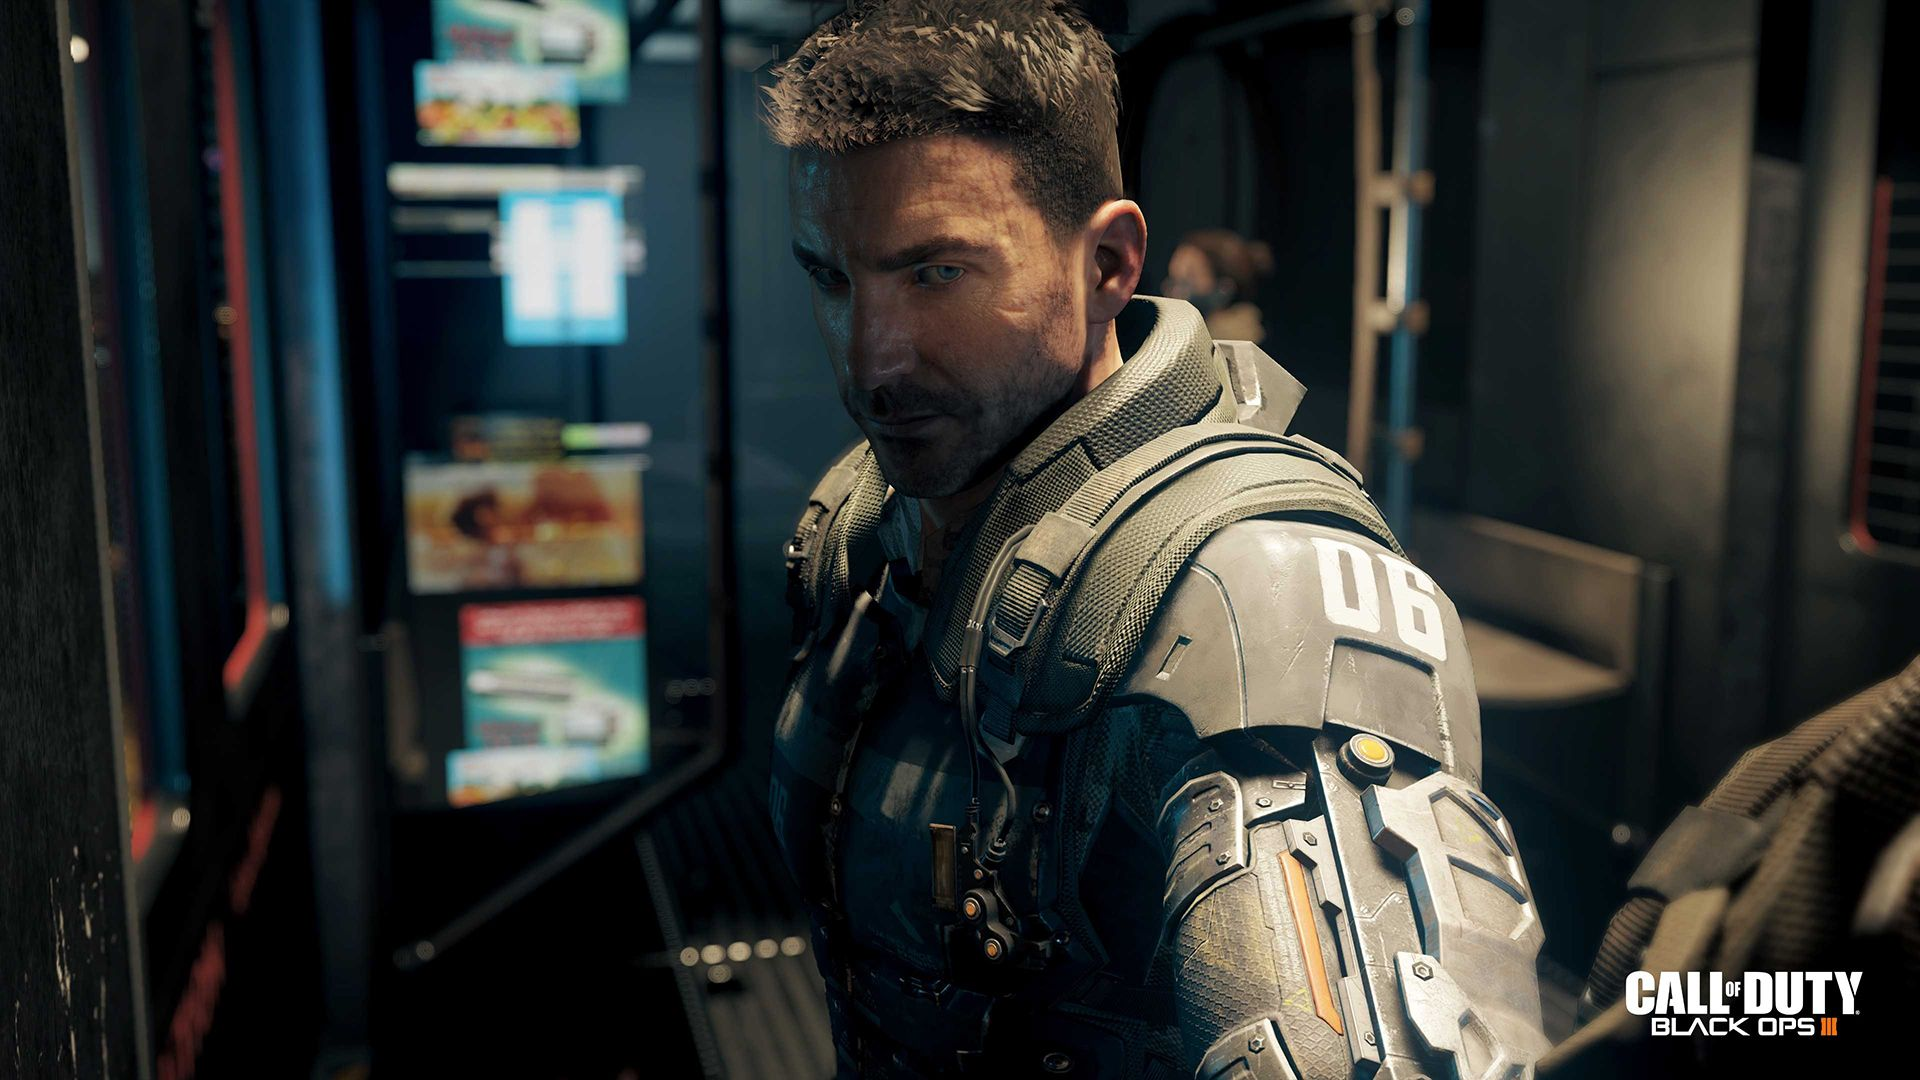 Call of Duty: Black Ops III (PC) - 9